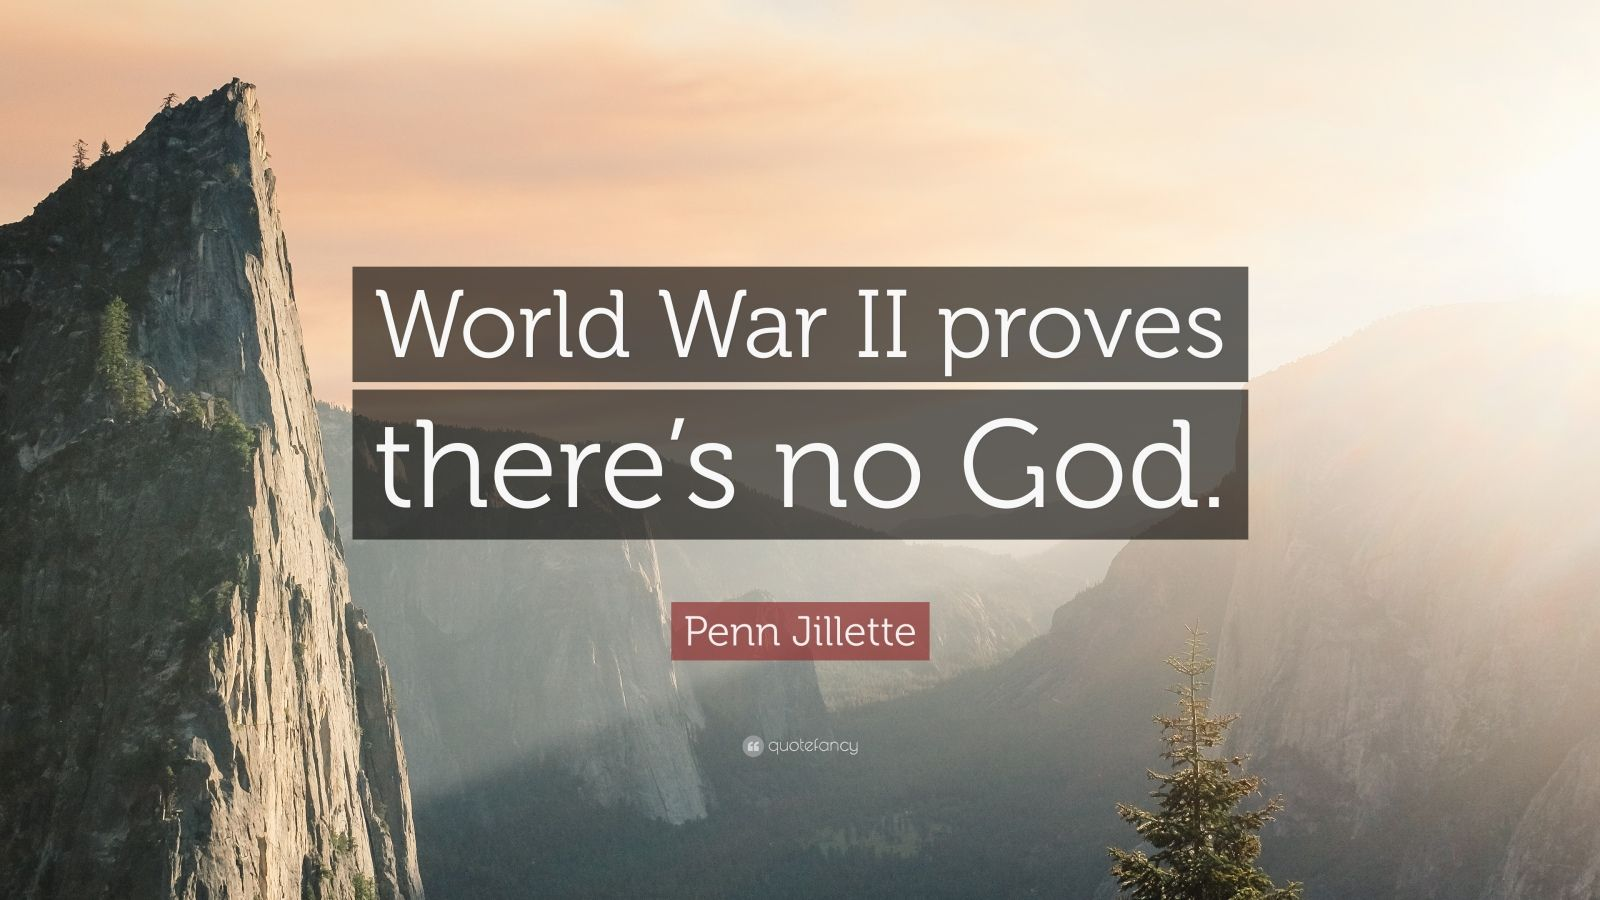 penn jillette there is no god essay